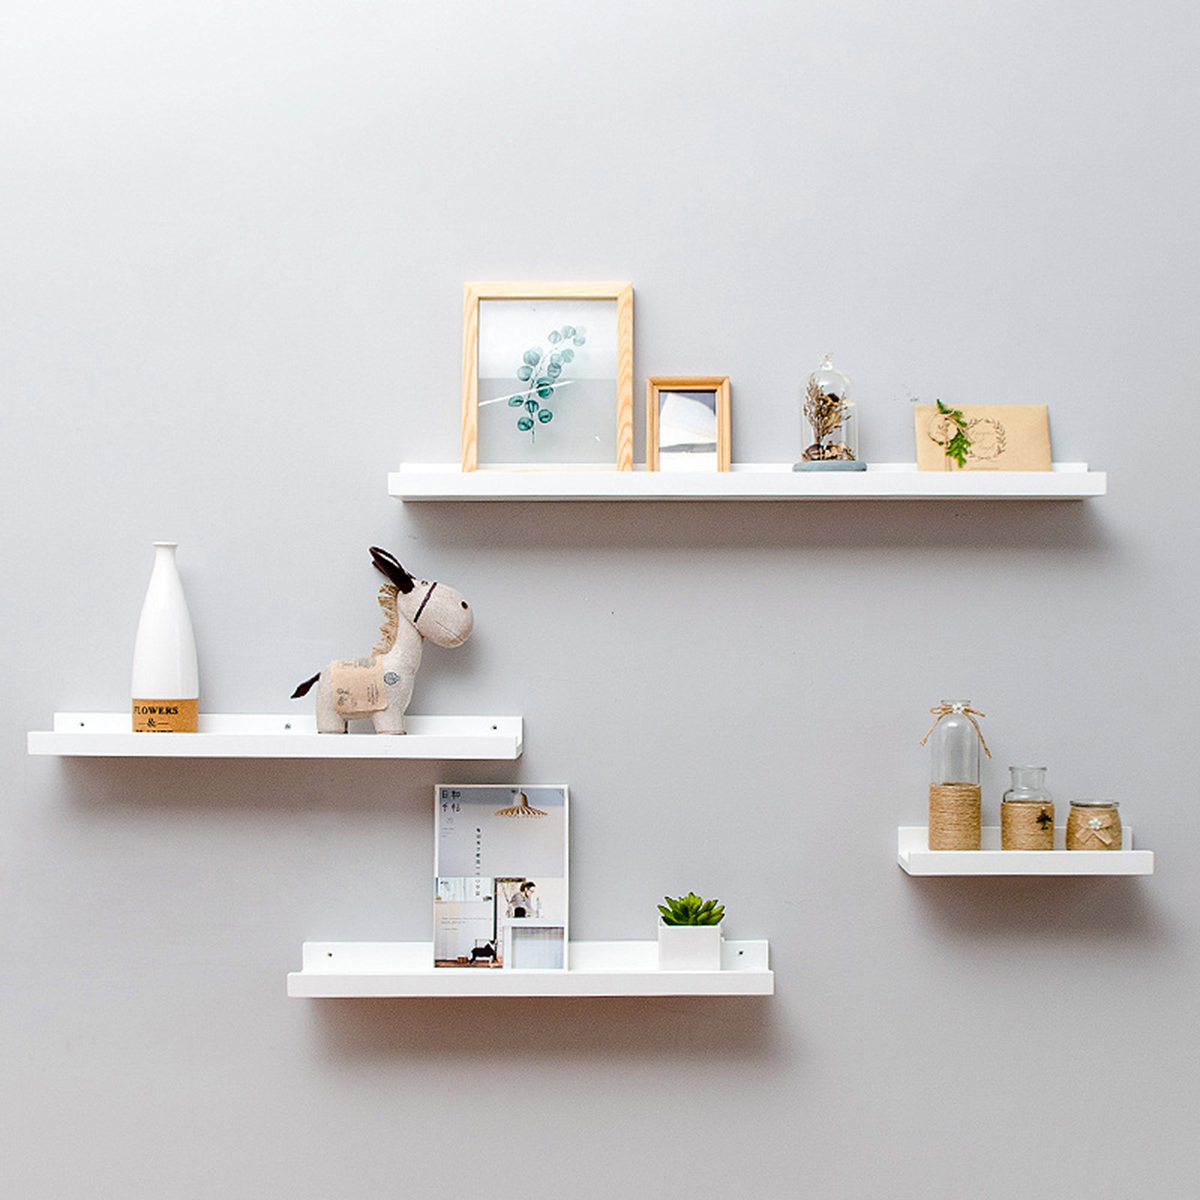 1pc Bamboo Wall Shelf Floating Ledge Storage Wall Shelves